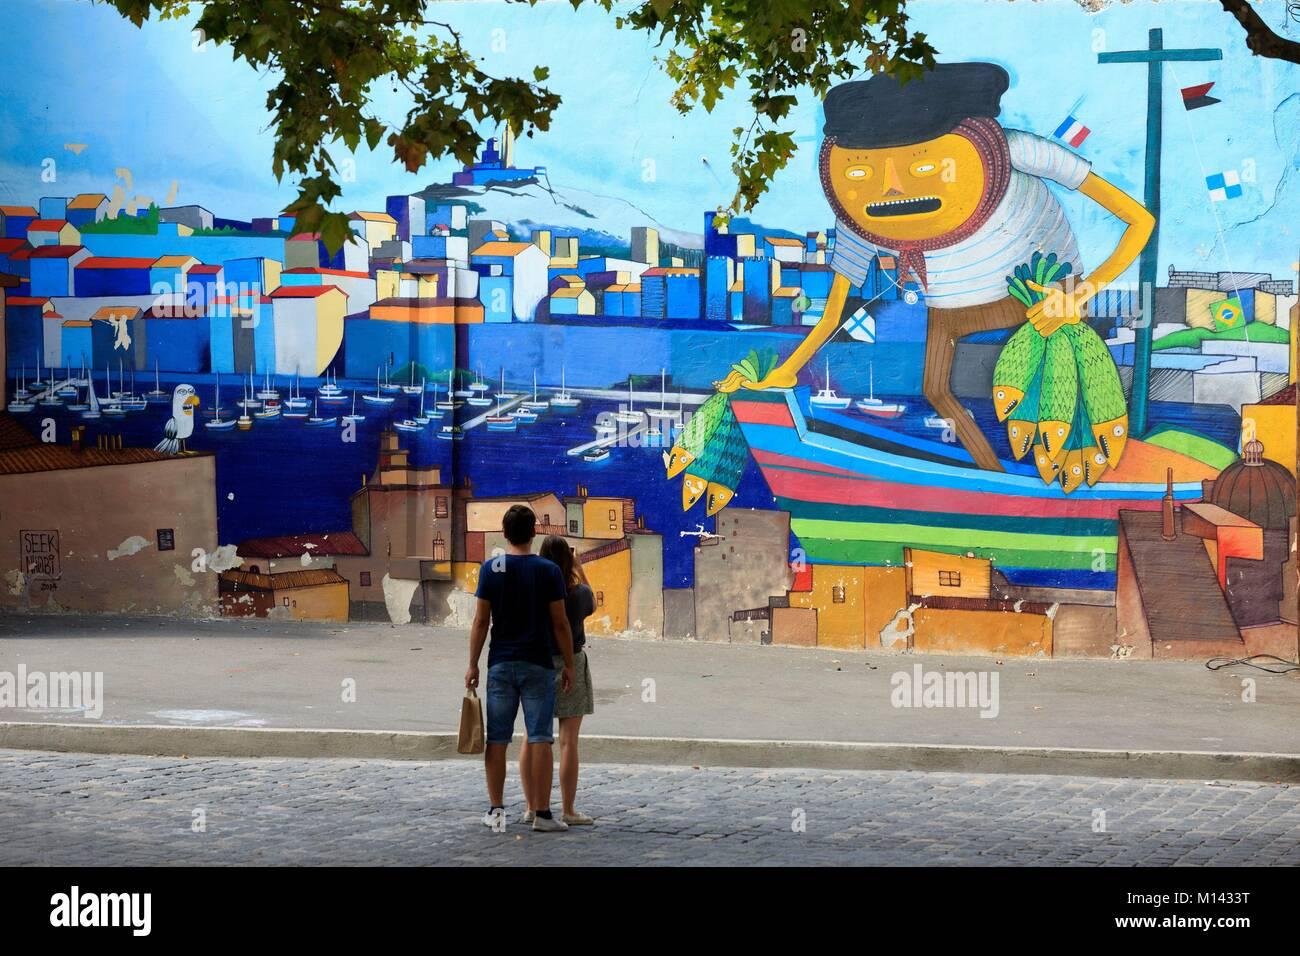 Francia, Bouches du Rhone, Marsiglia, Euromediterranee zona quartiere Panier, Arte di strada tour, tour guidato Immagini Stock